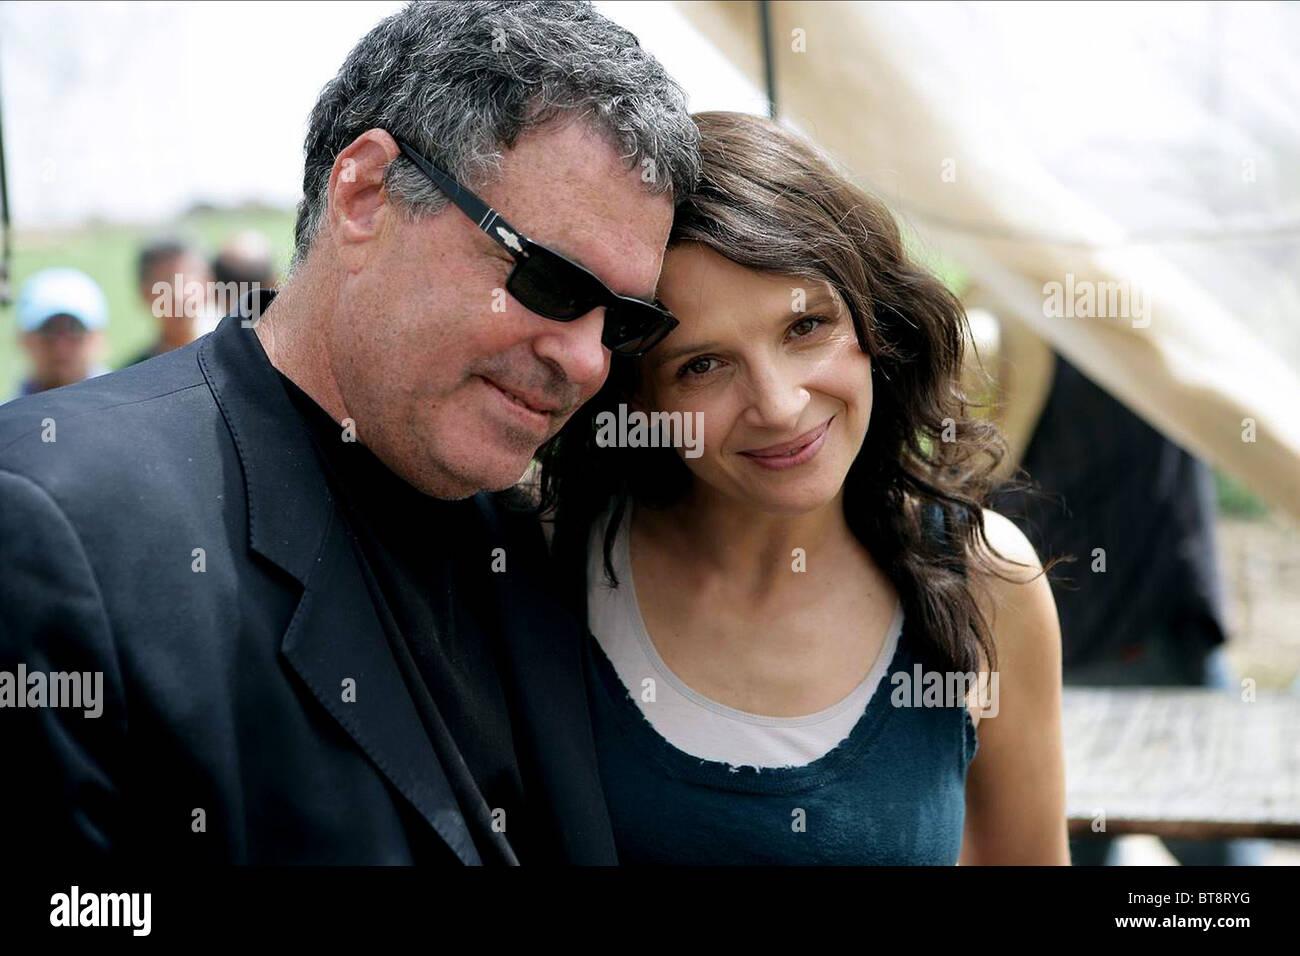 AMOS GITAI & JULIETTE BINOCHE DISENGAGEMENT (2007) - Stock Image